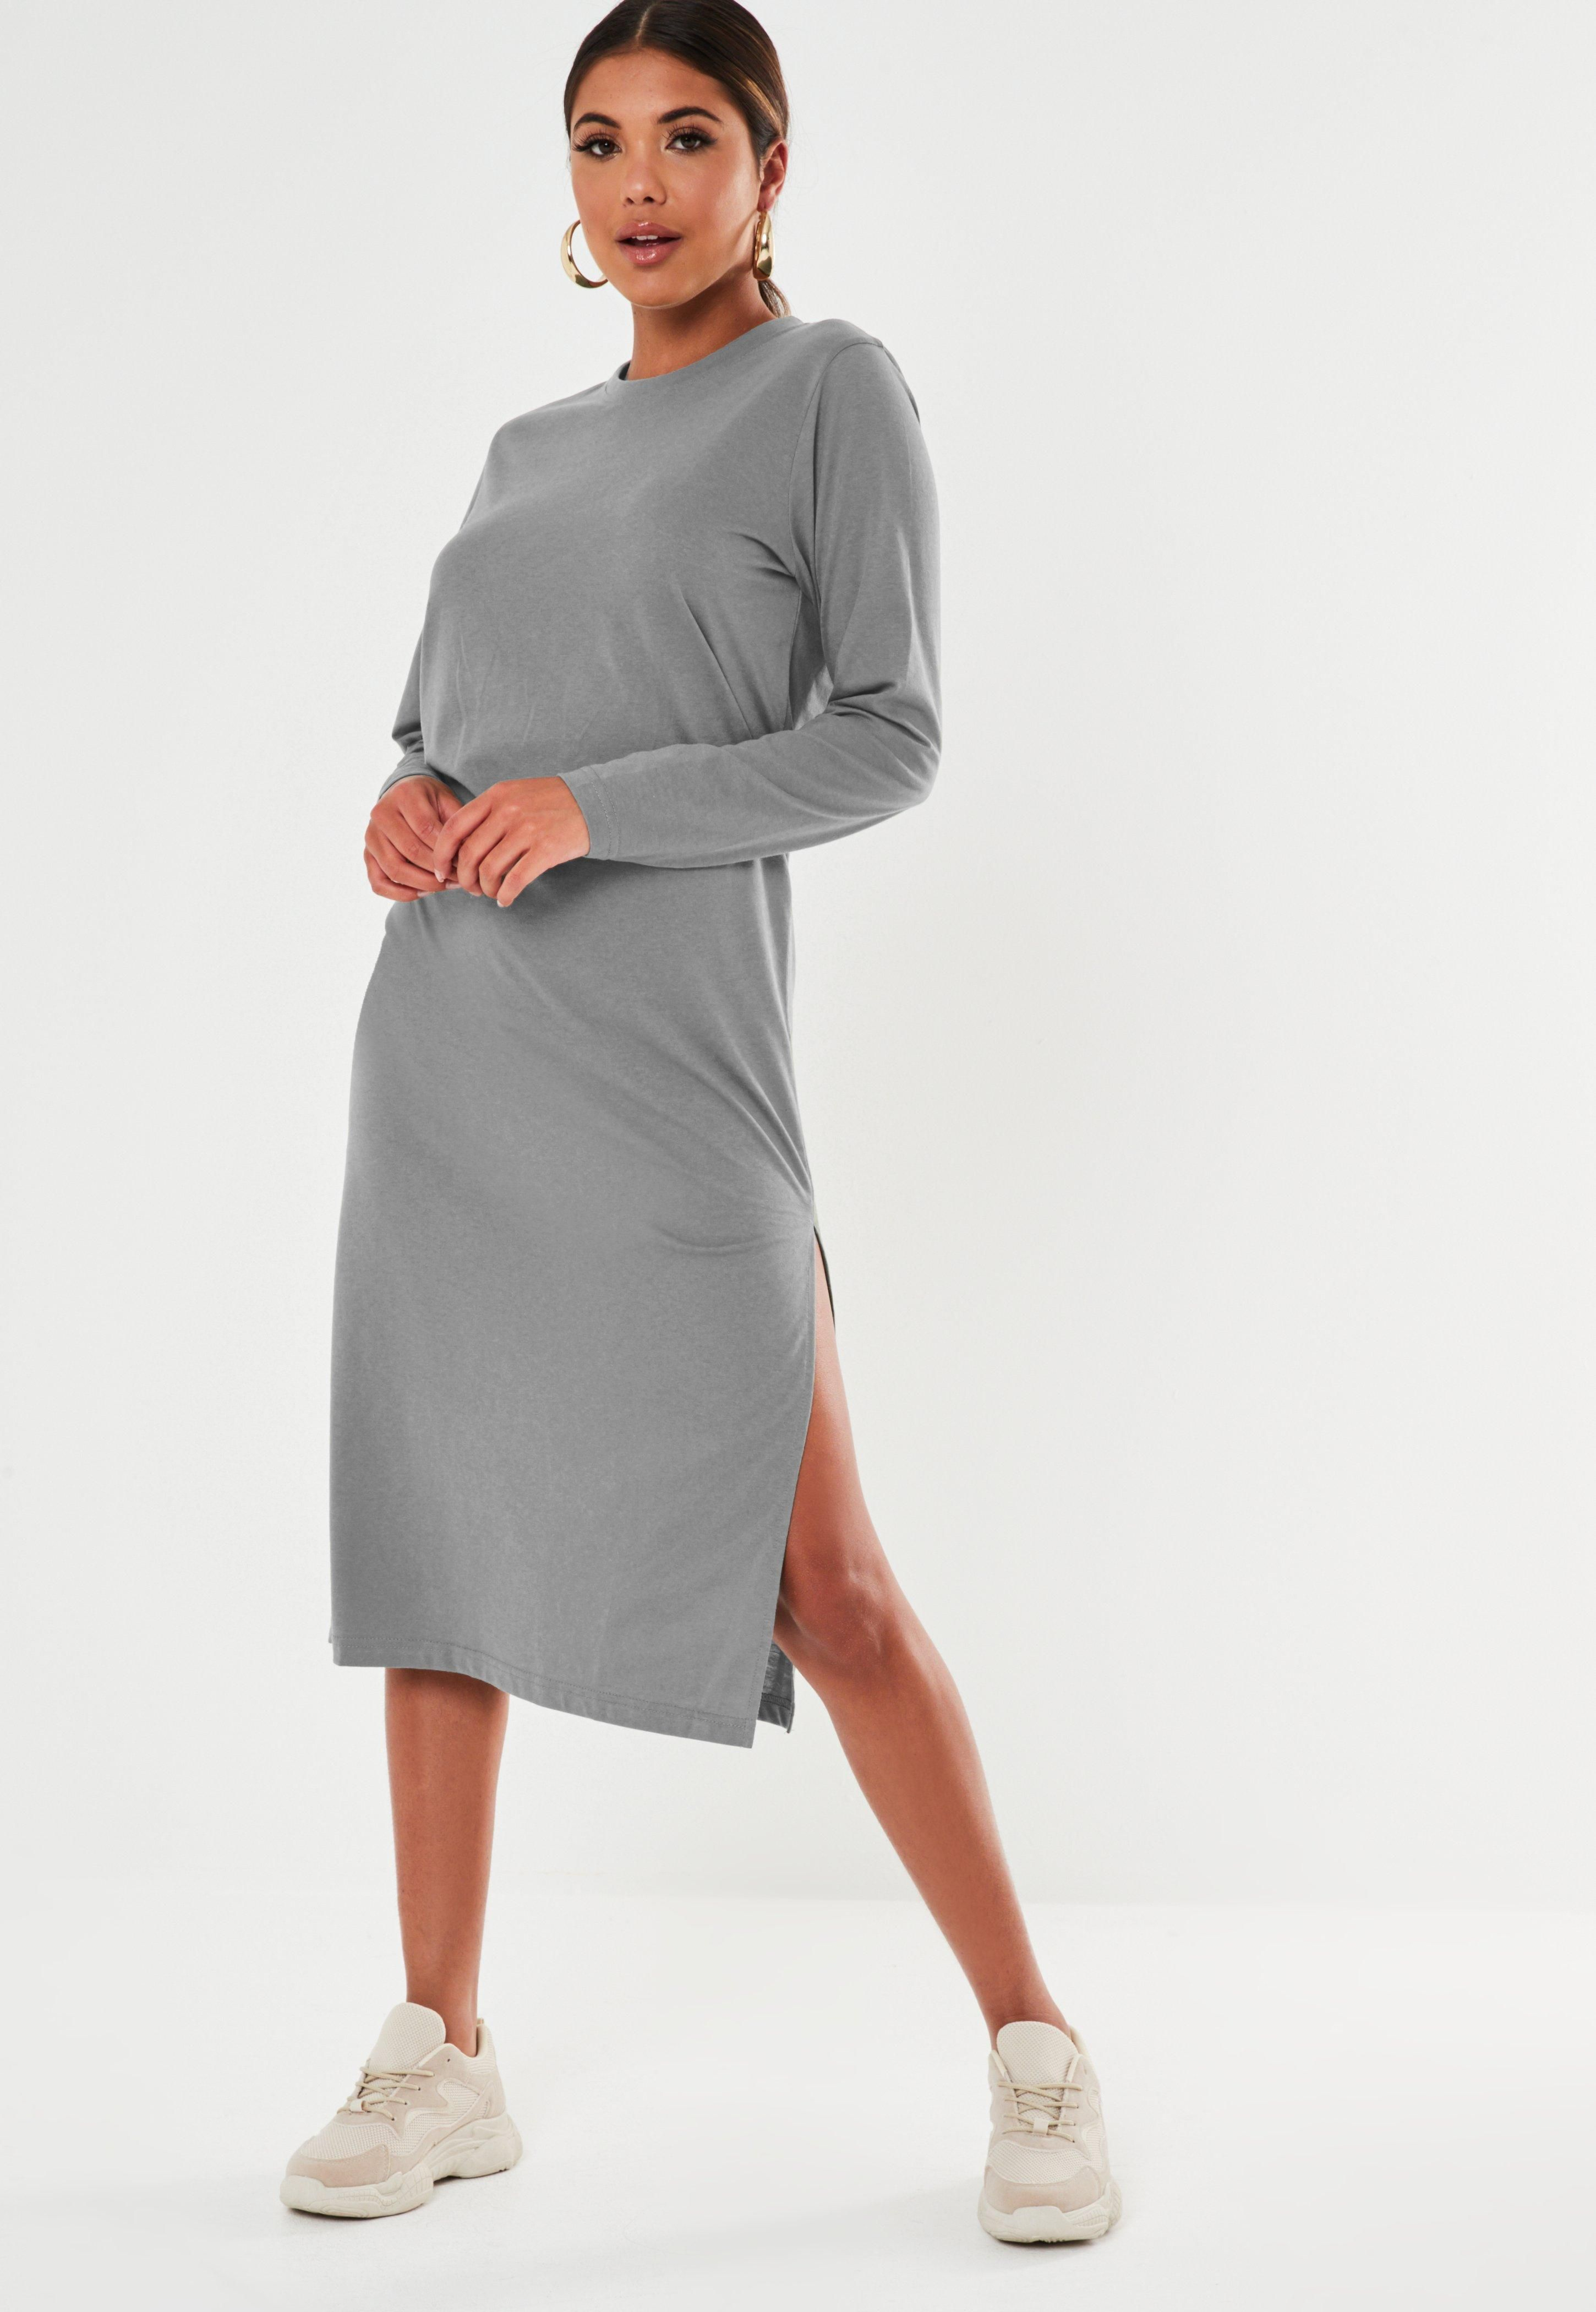 Dark Gray Basic Long Sleeve Midi T Shirt Dress #Sponsored #Basic ...